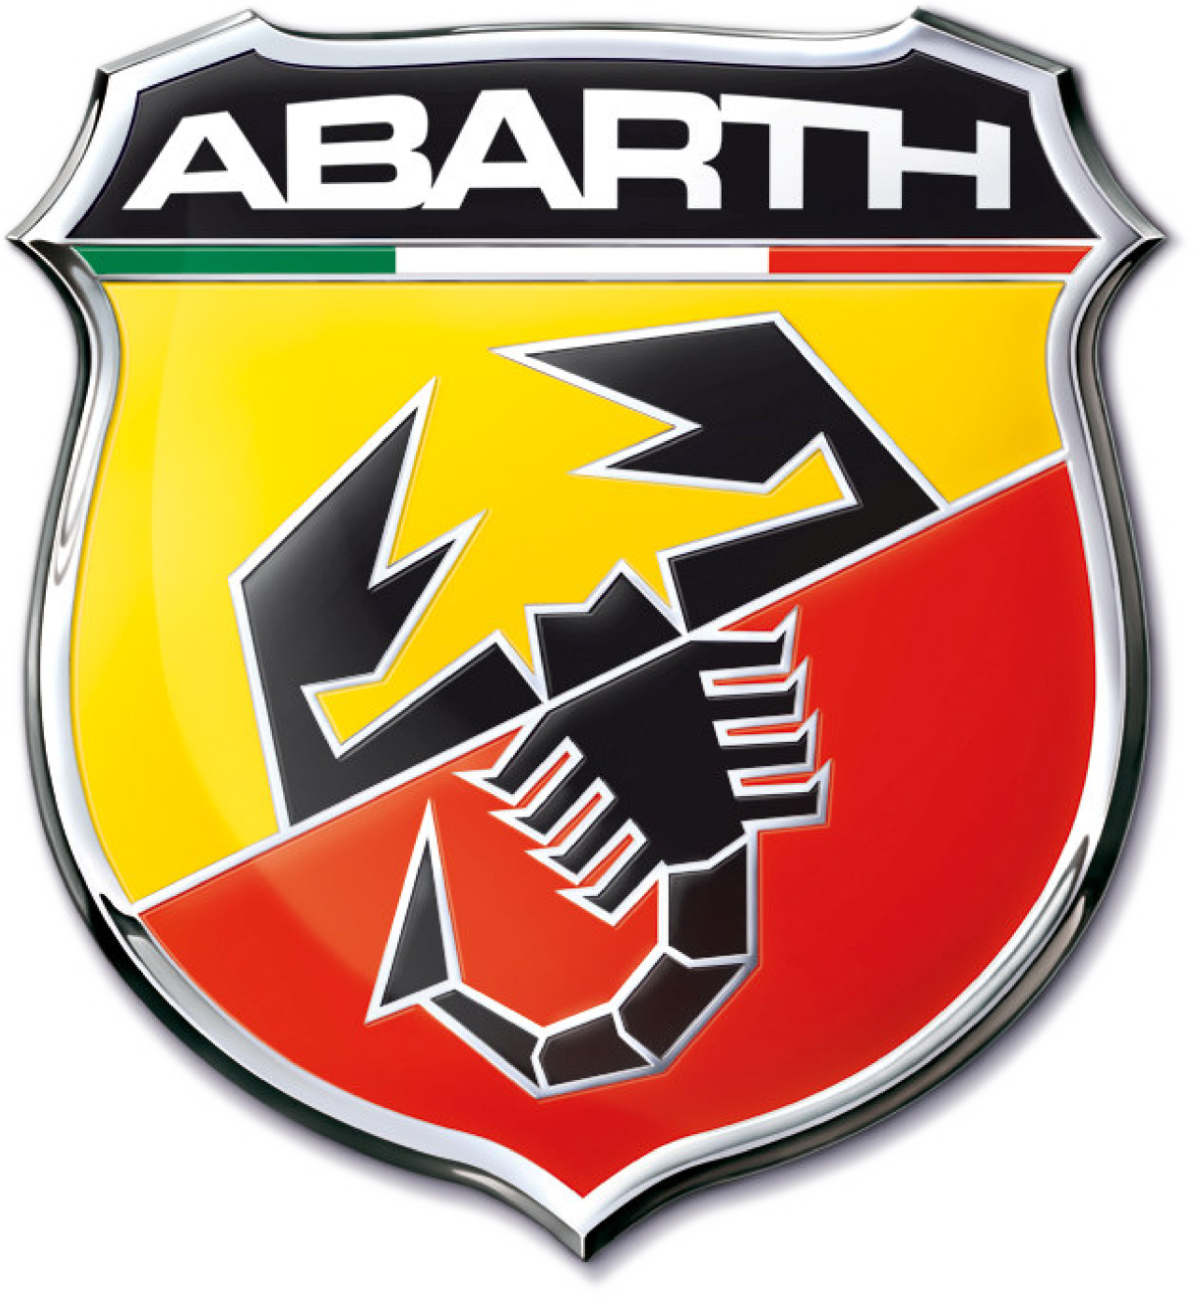 Interior Abarth